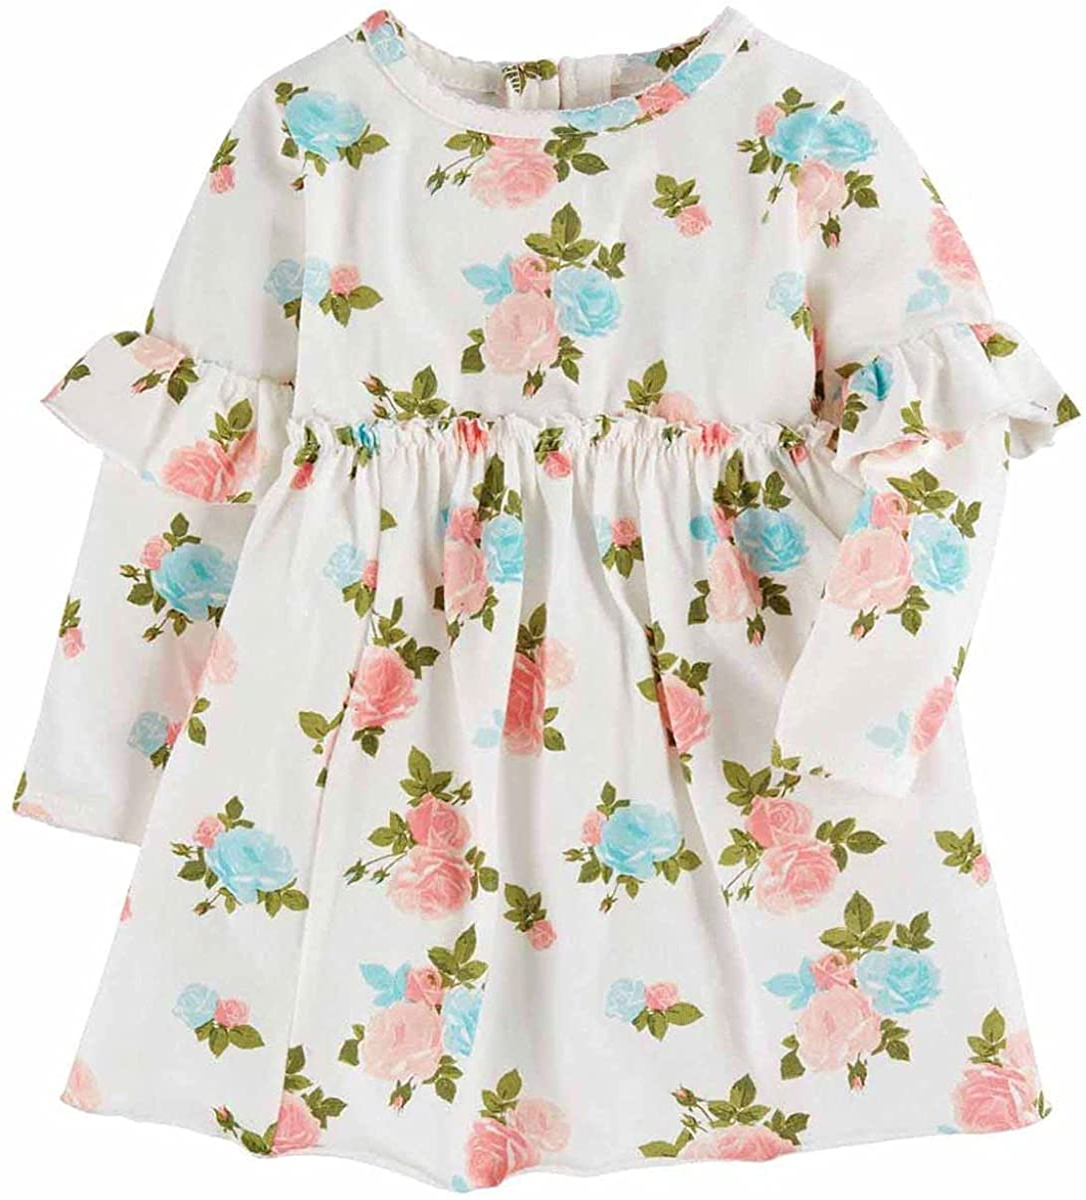 Minneapolis Mall Super sale Mud Pie Baby Girls' Infant Dress Rose